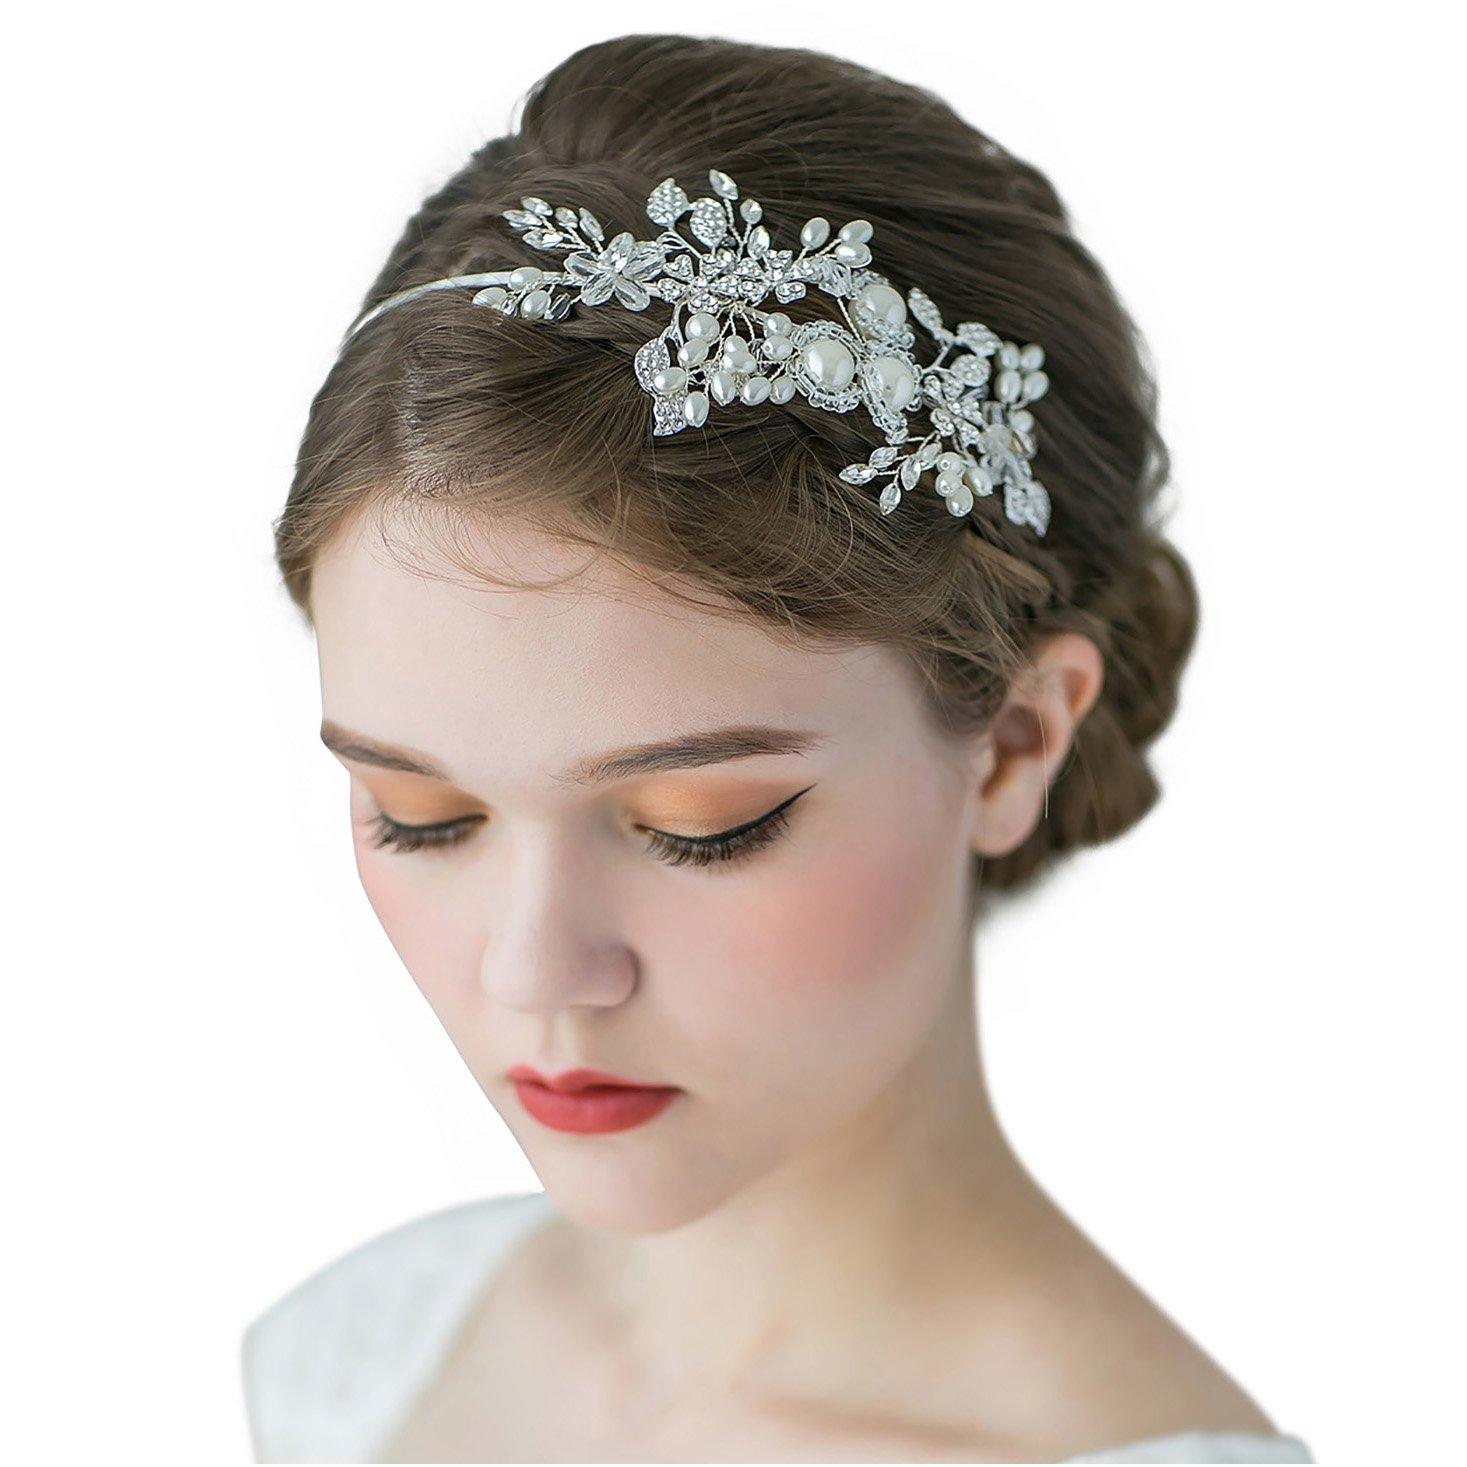 Luxury goods SWEETV Handmade Pearl Wedding Headbands Women Recommended Silver Rhinest for